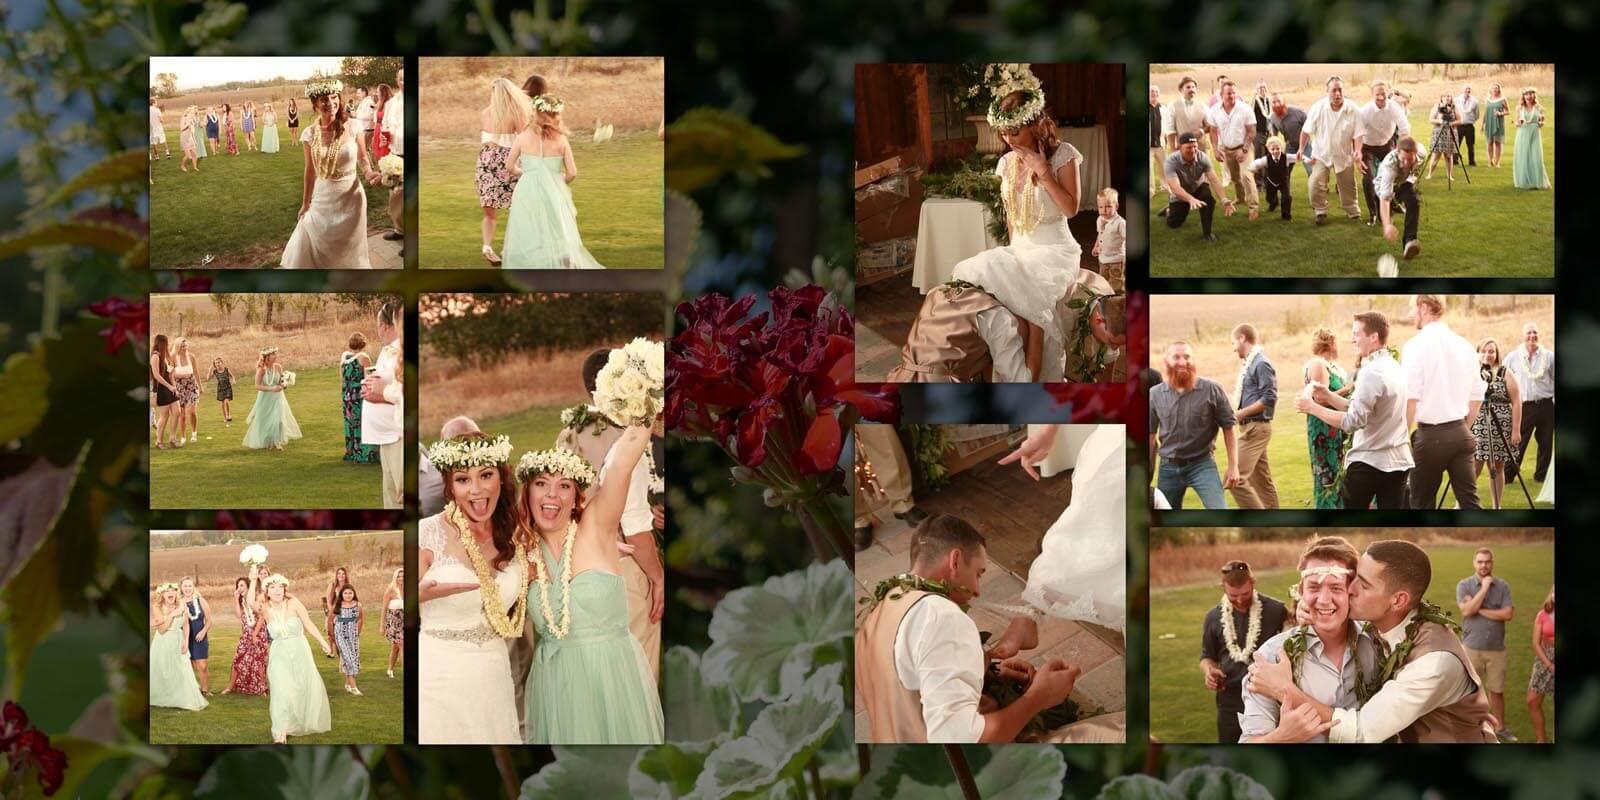 Jasper-House-Farm-Outdoor-Wedding-Lane-County-Oregon-photographers-056-057.jpg